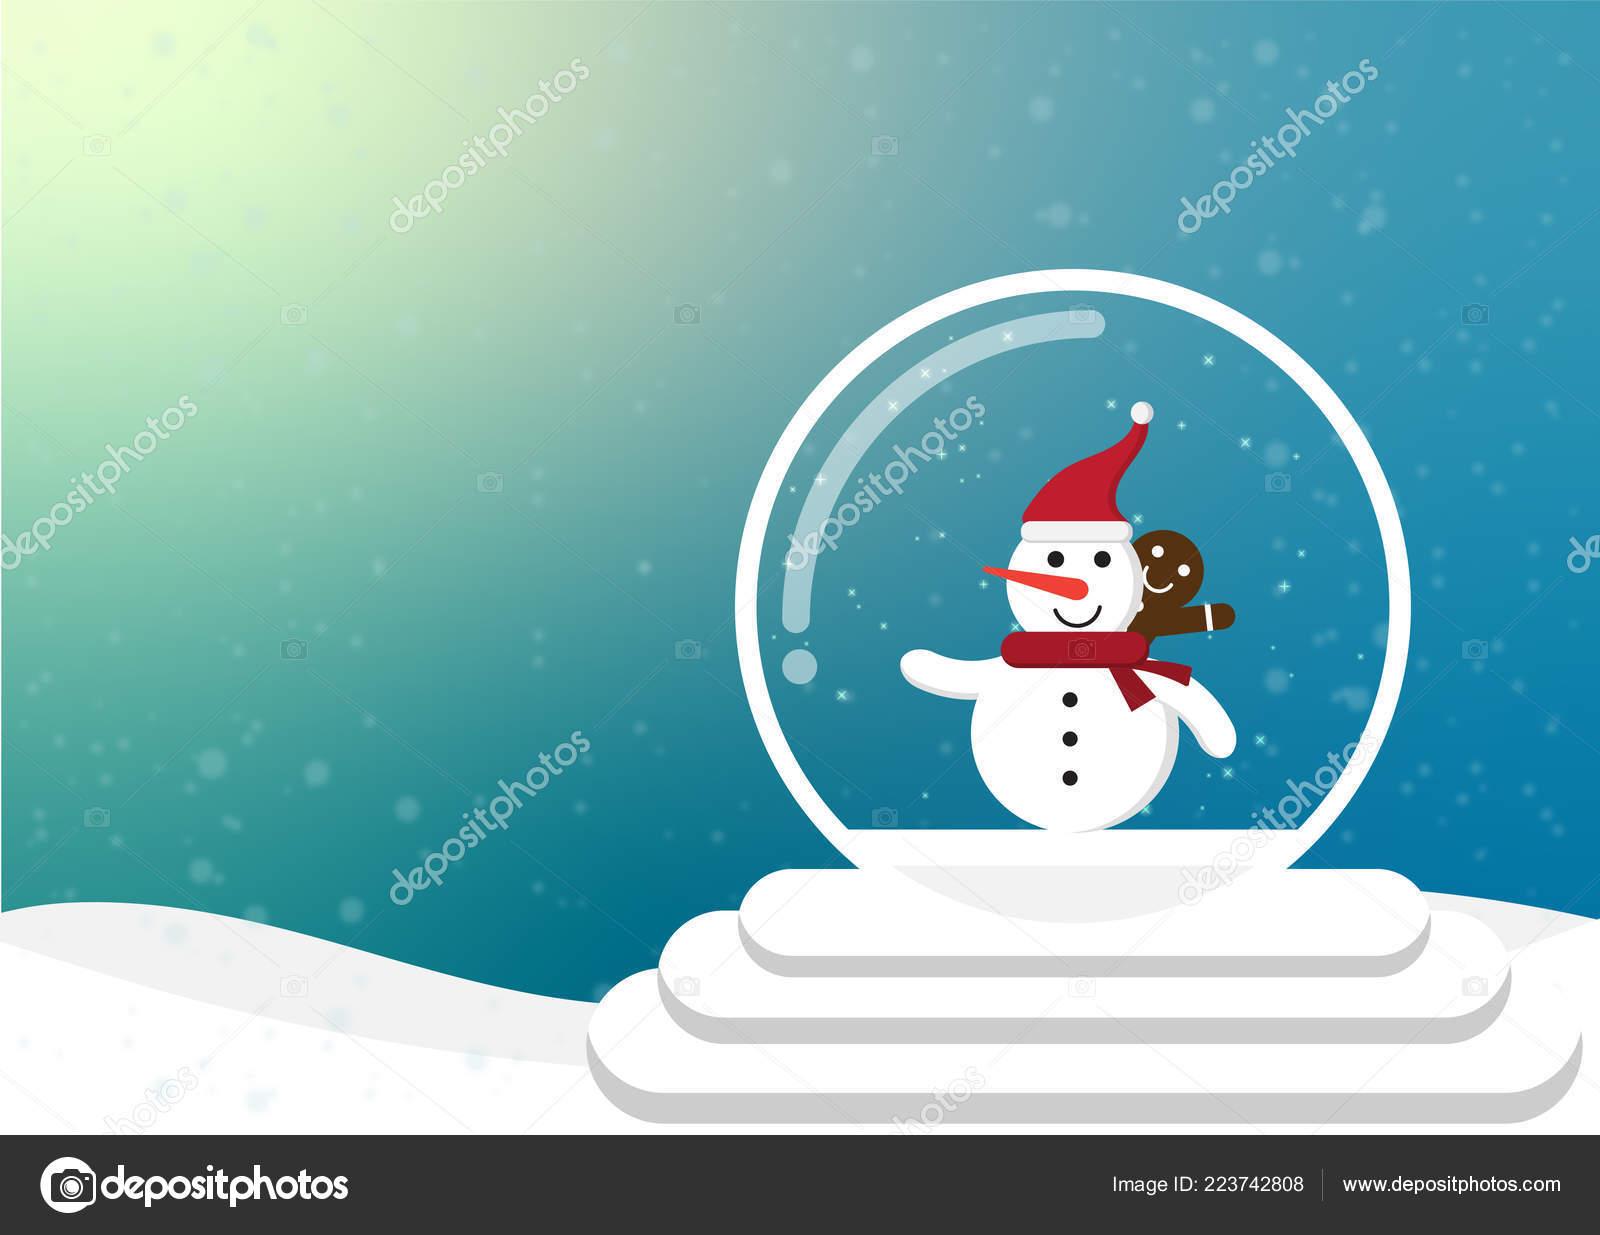 Cartoon christmas and winter season with flat design — Vector by life_killer_2030@hotmail.com